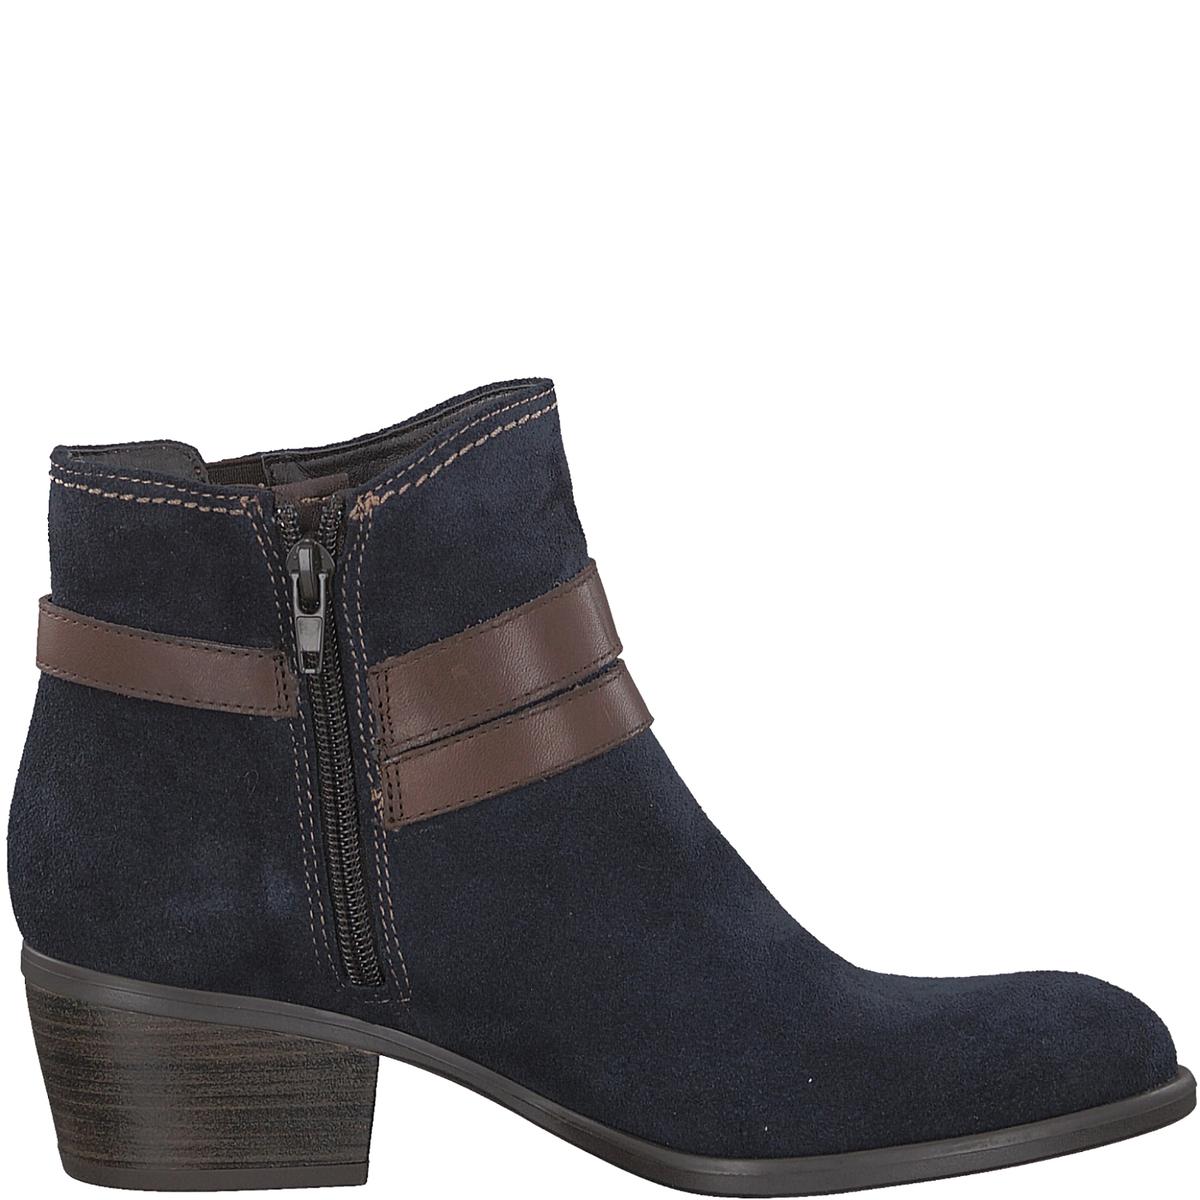 Ботильоны кожаные Becka цены онлайн